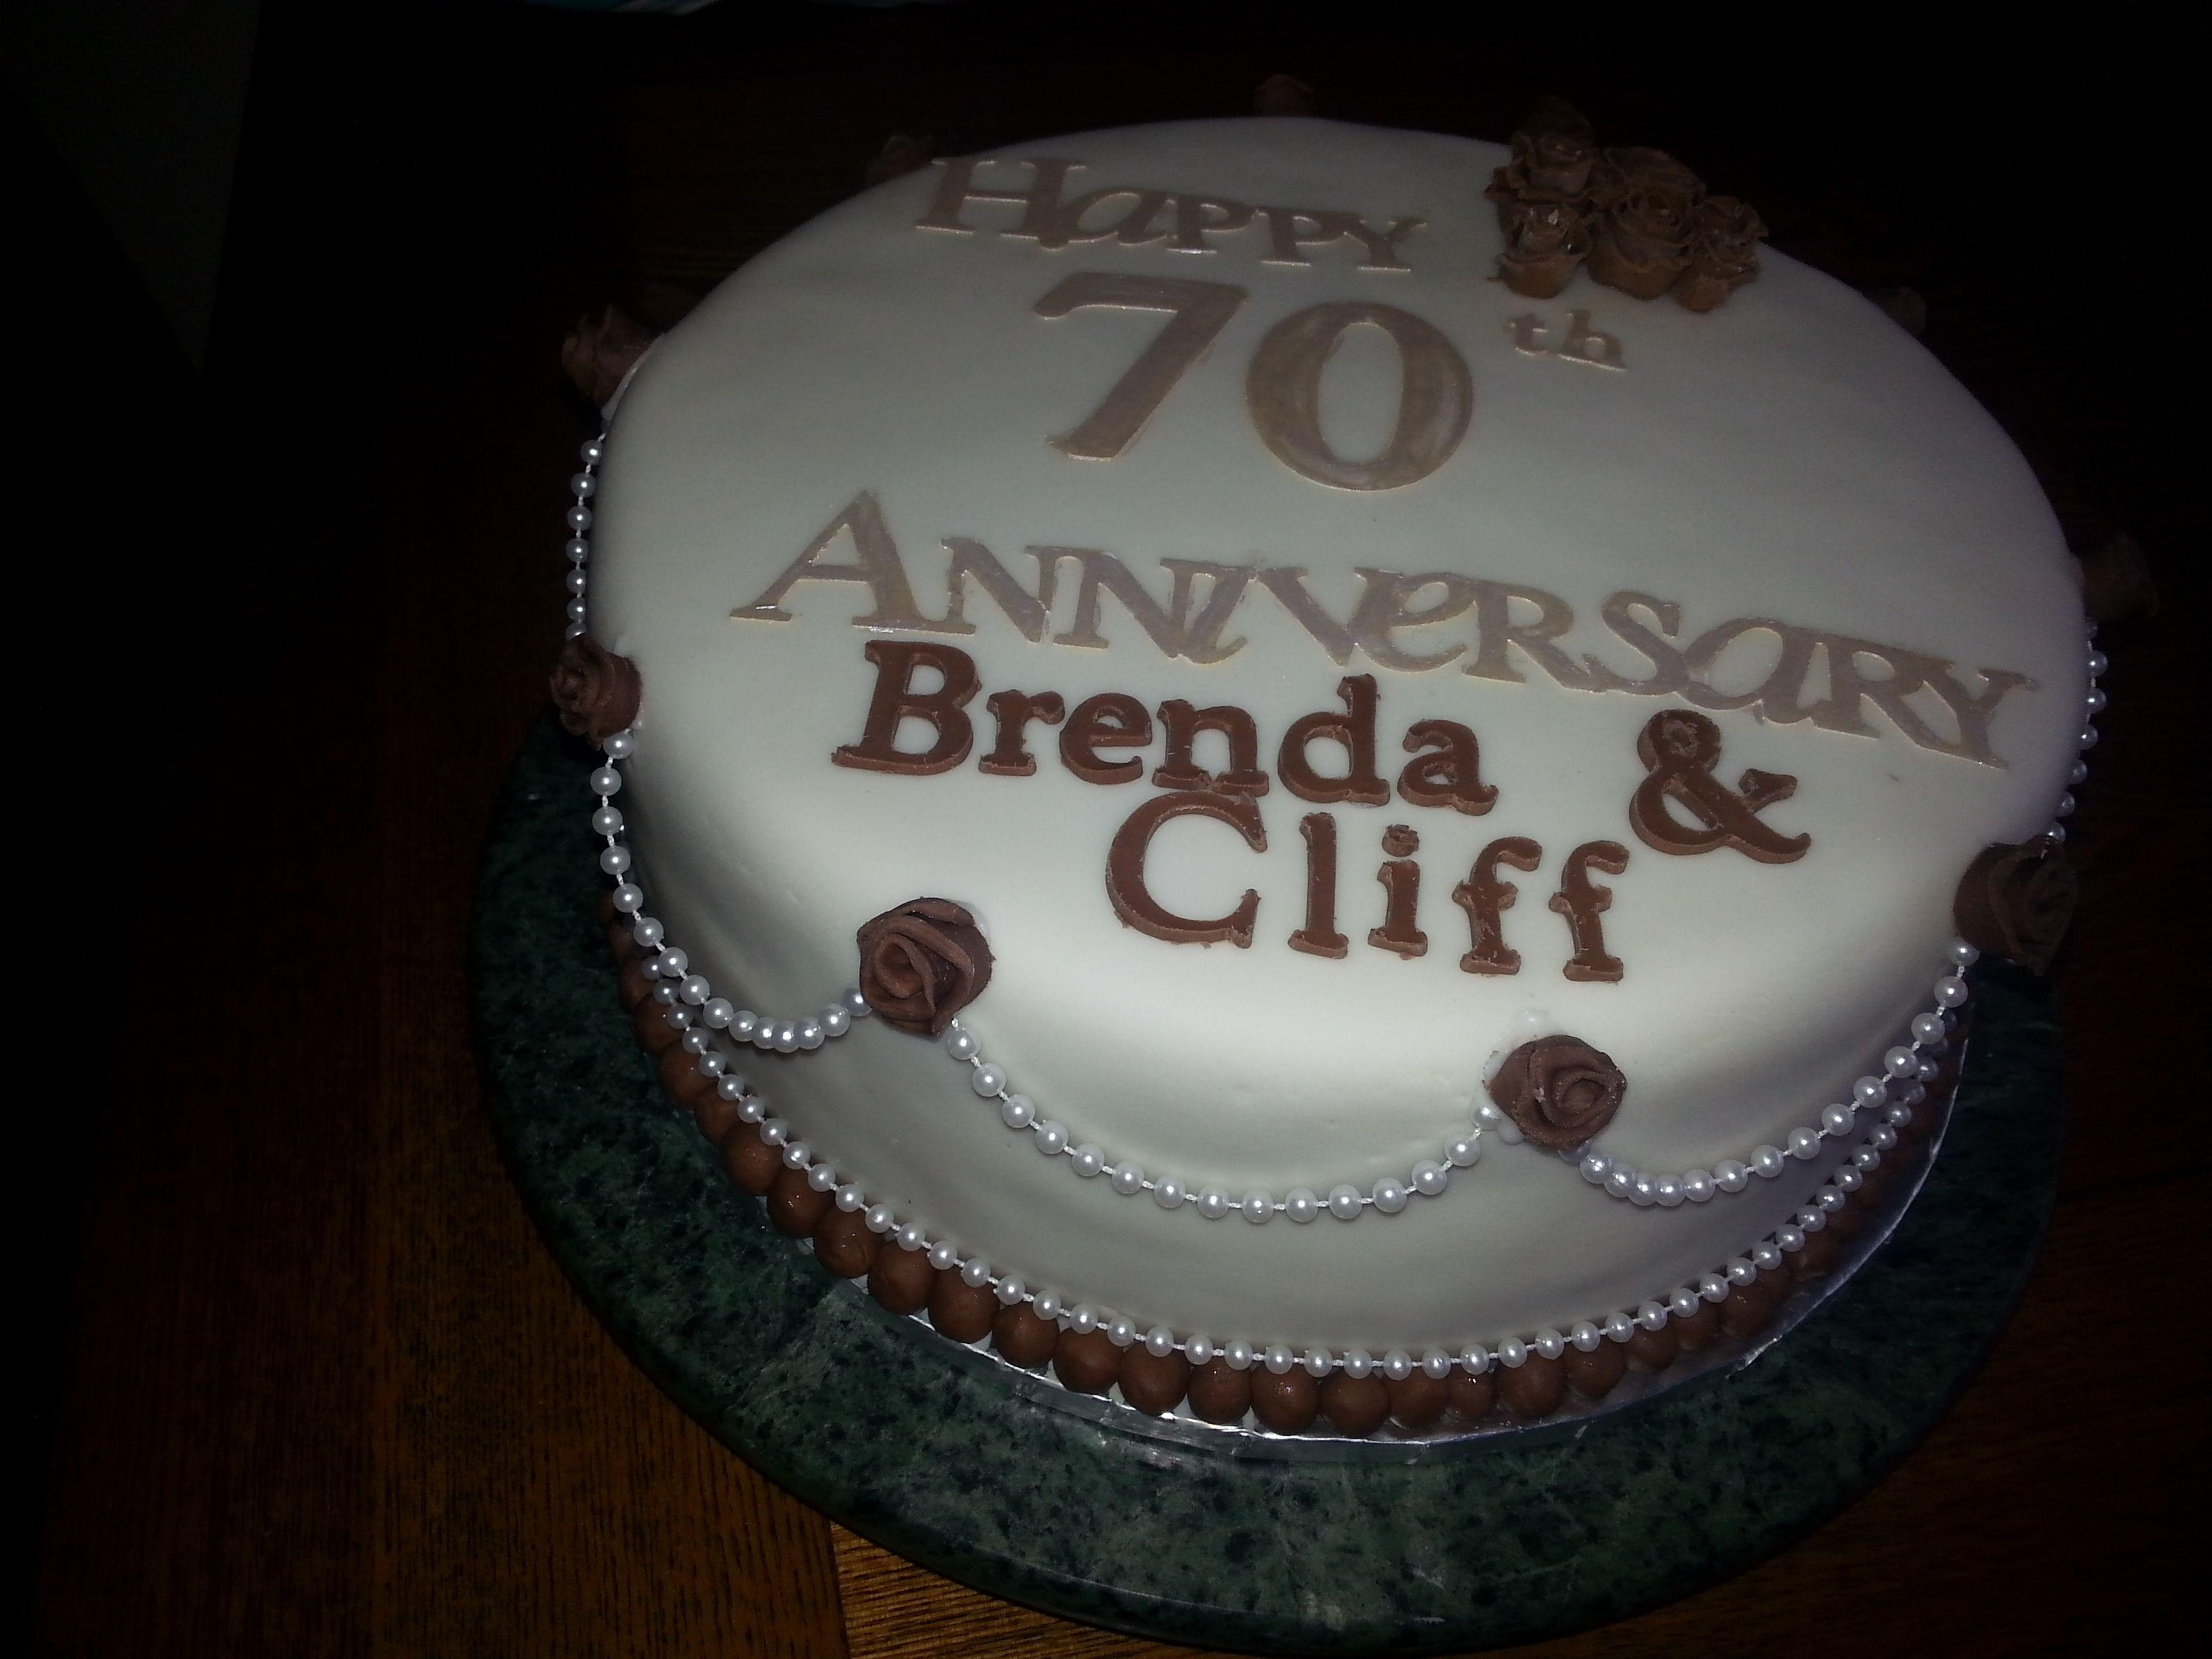 Th wedding anniversary my cakes pinterest cake